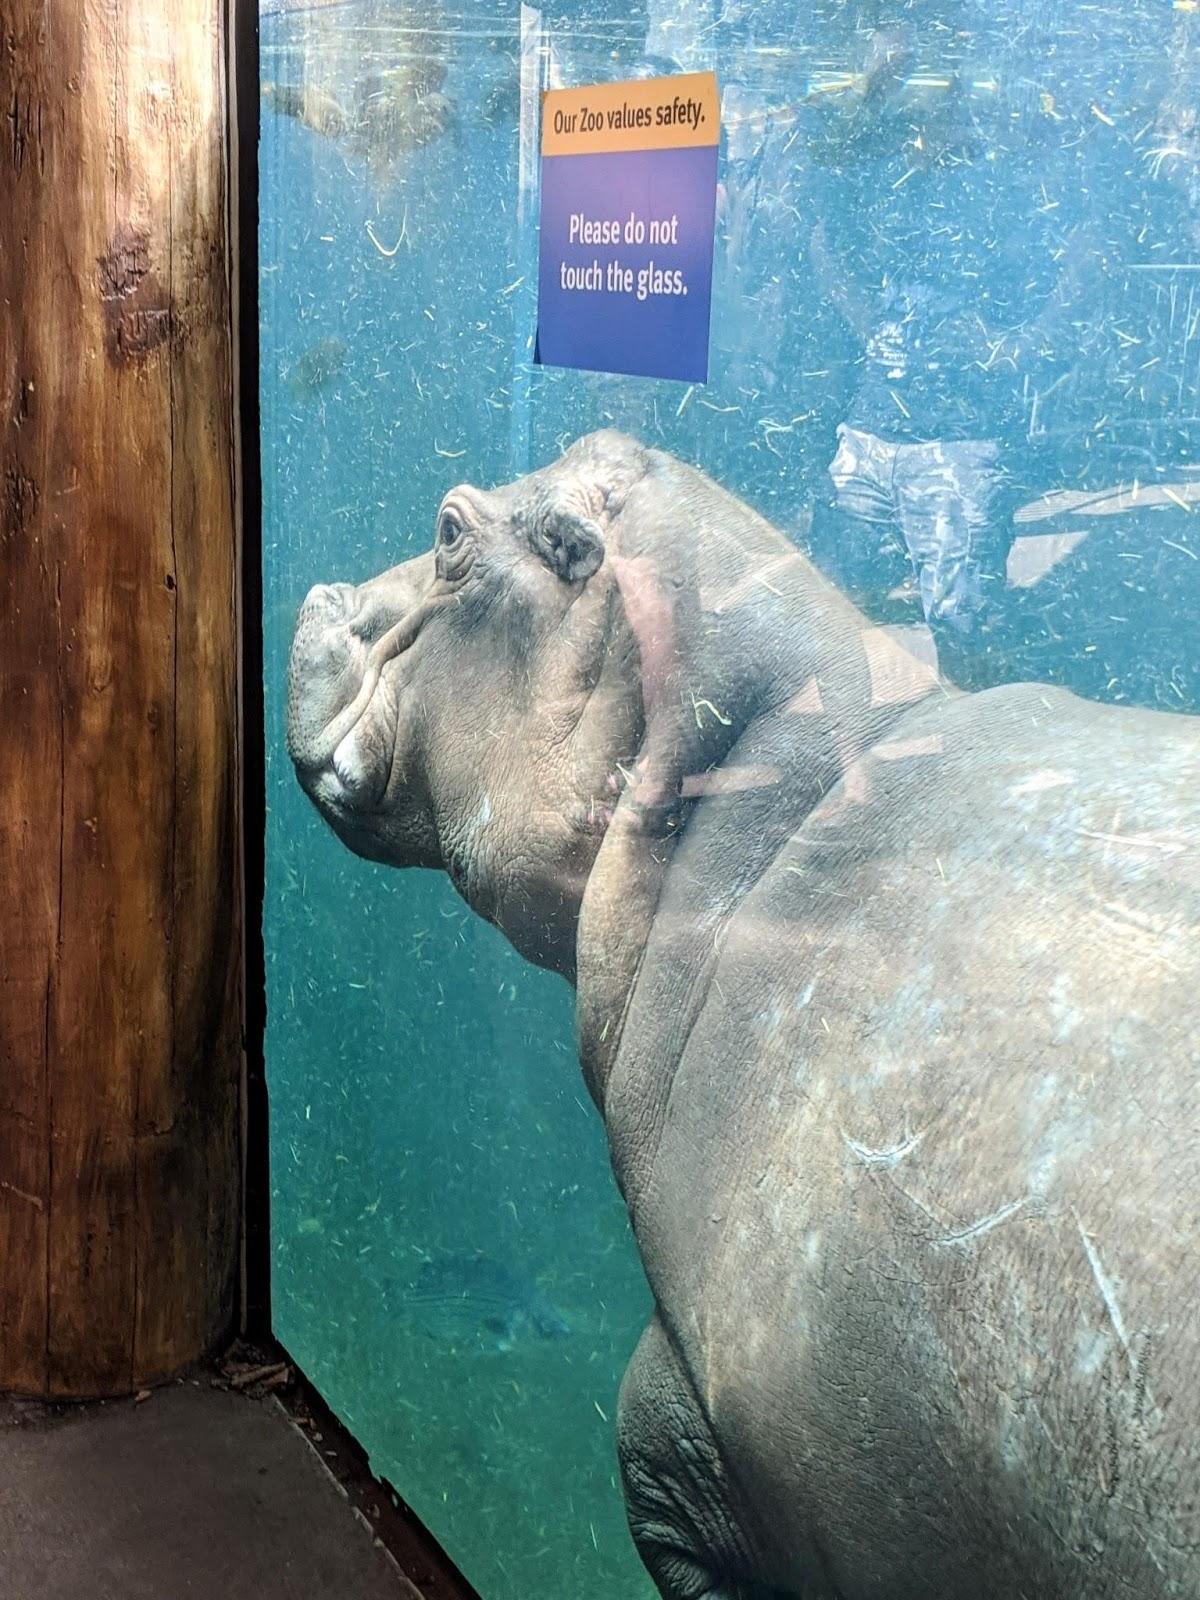 St. Louis free zoo